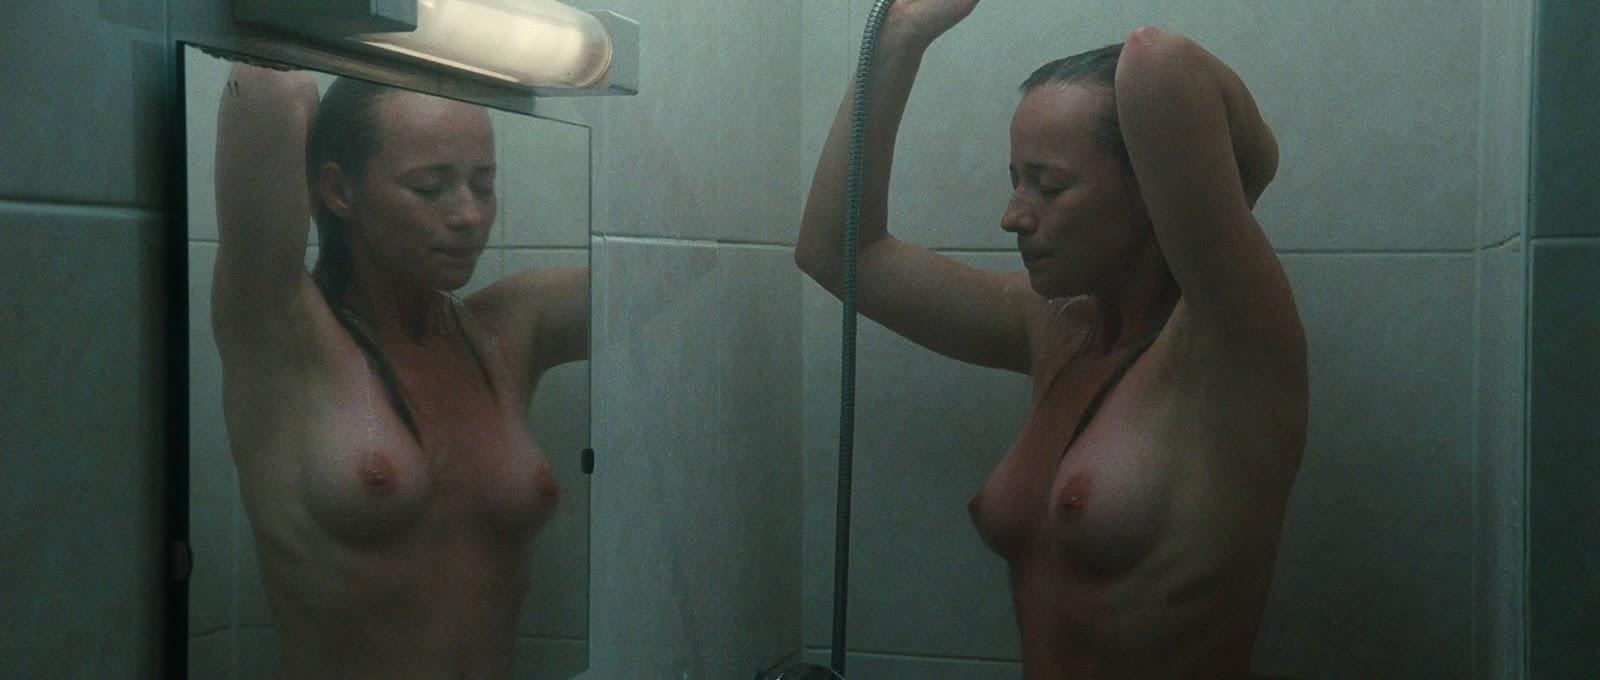 Superstar Camille Leblanc Bazinet Nude Images